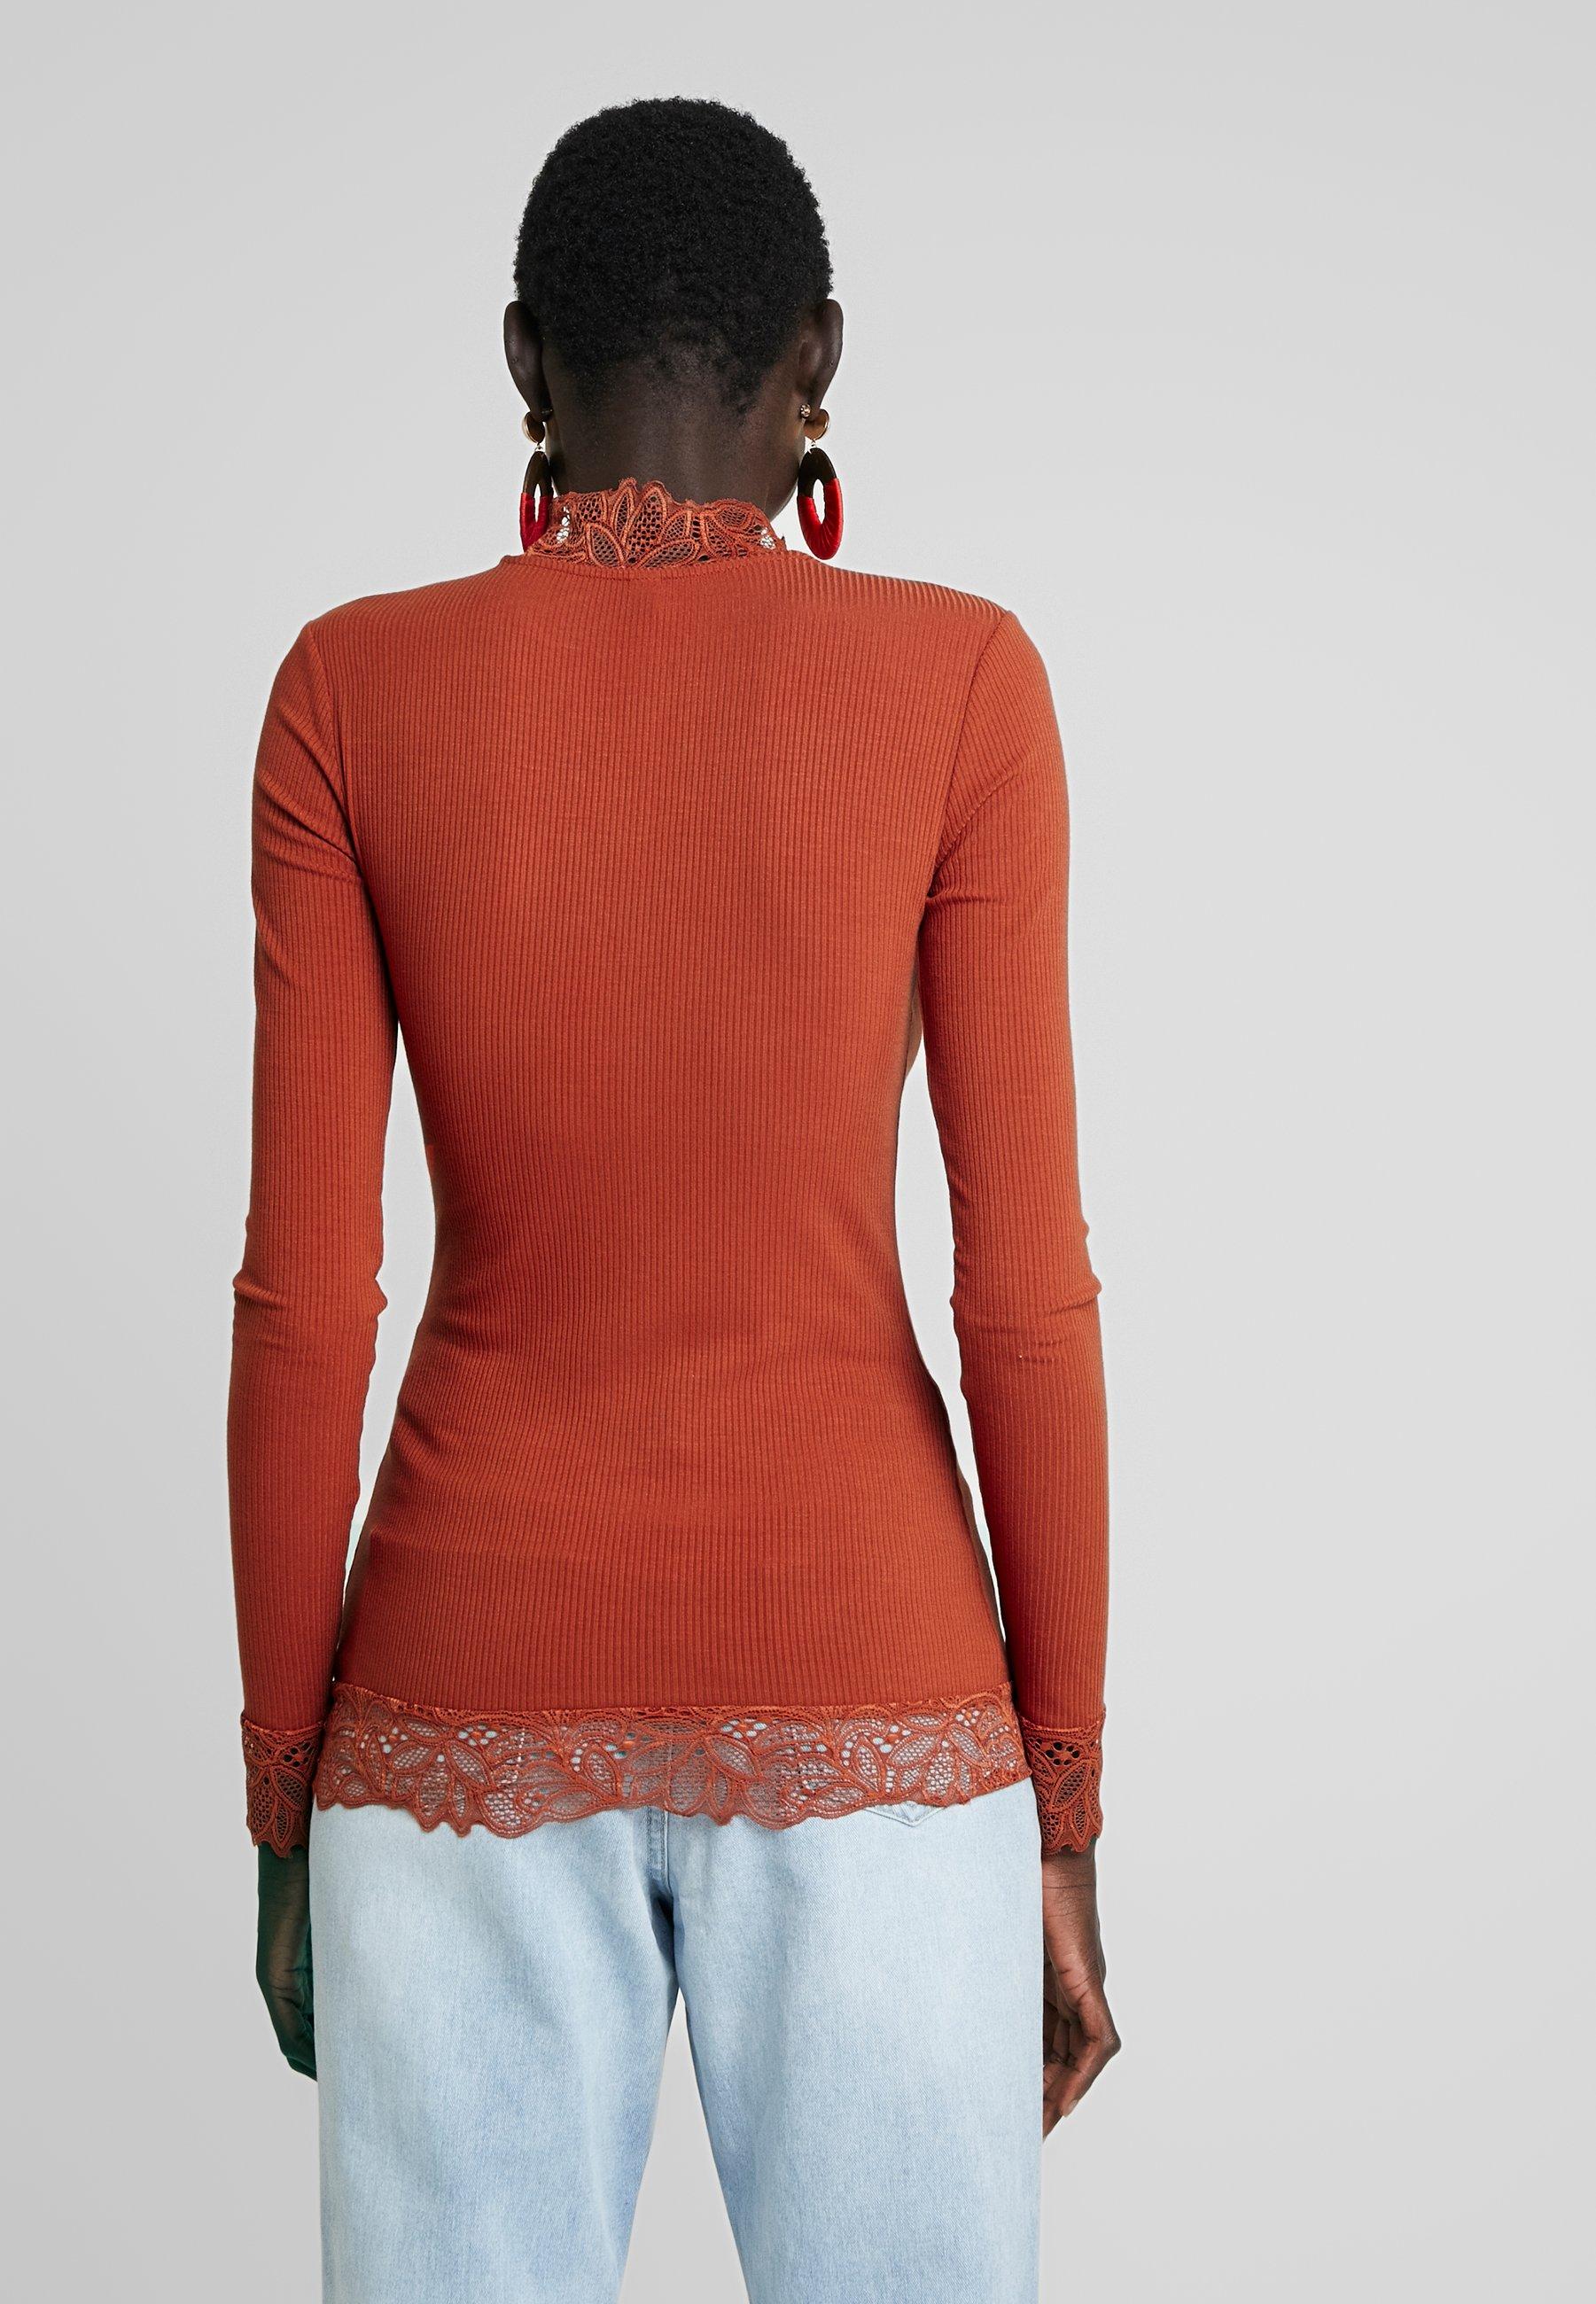 YaselleT shirt Tea Manches Longues Tall Rooibos À Yas 1cFTlKJ